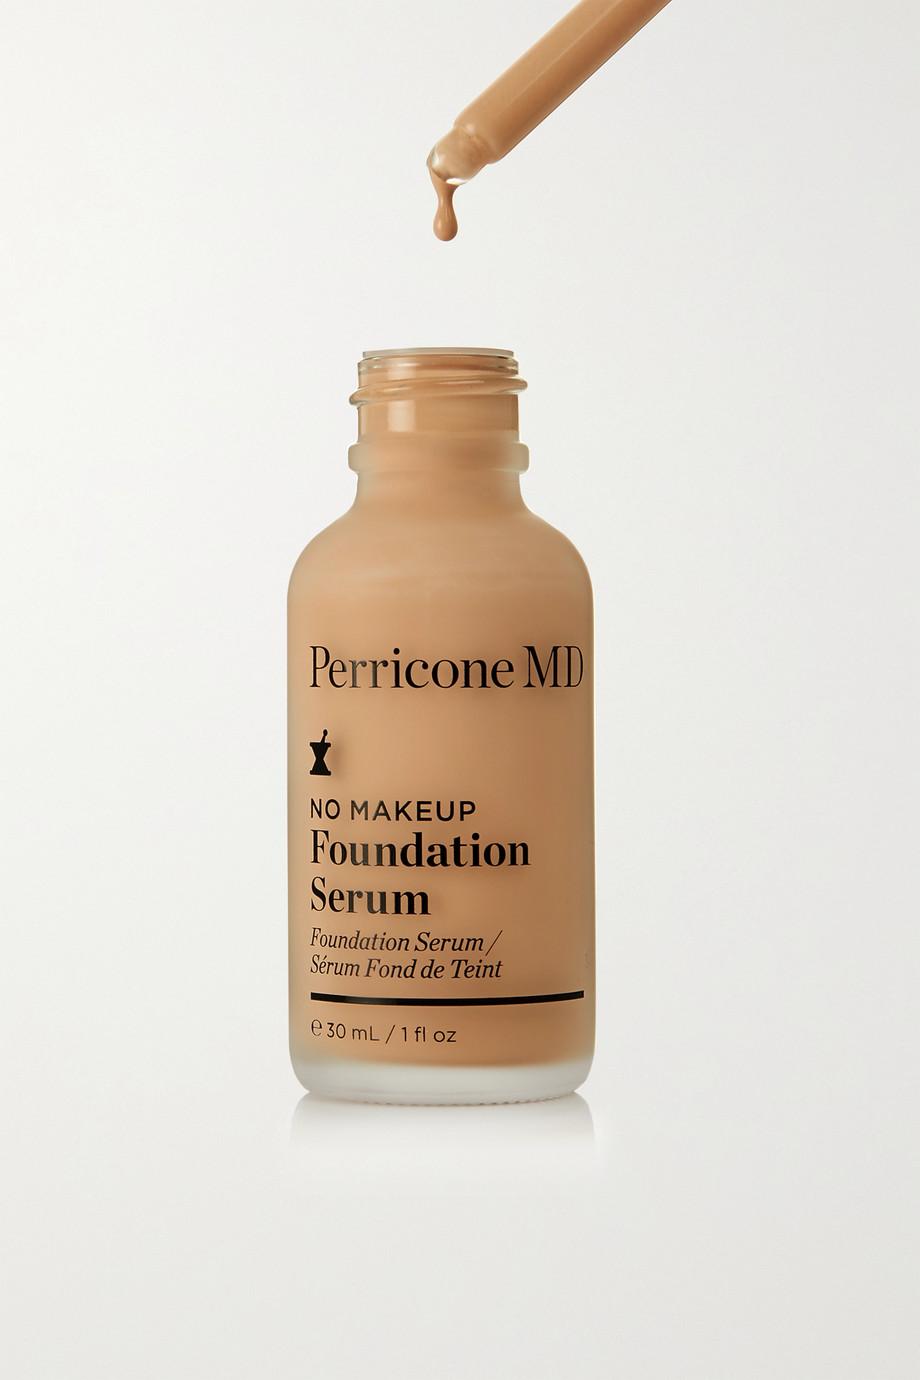 Perricone MD No Makeup Foundation Serum Broad Spectrum SPF20 - Tan, 30ml